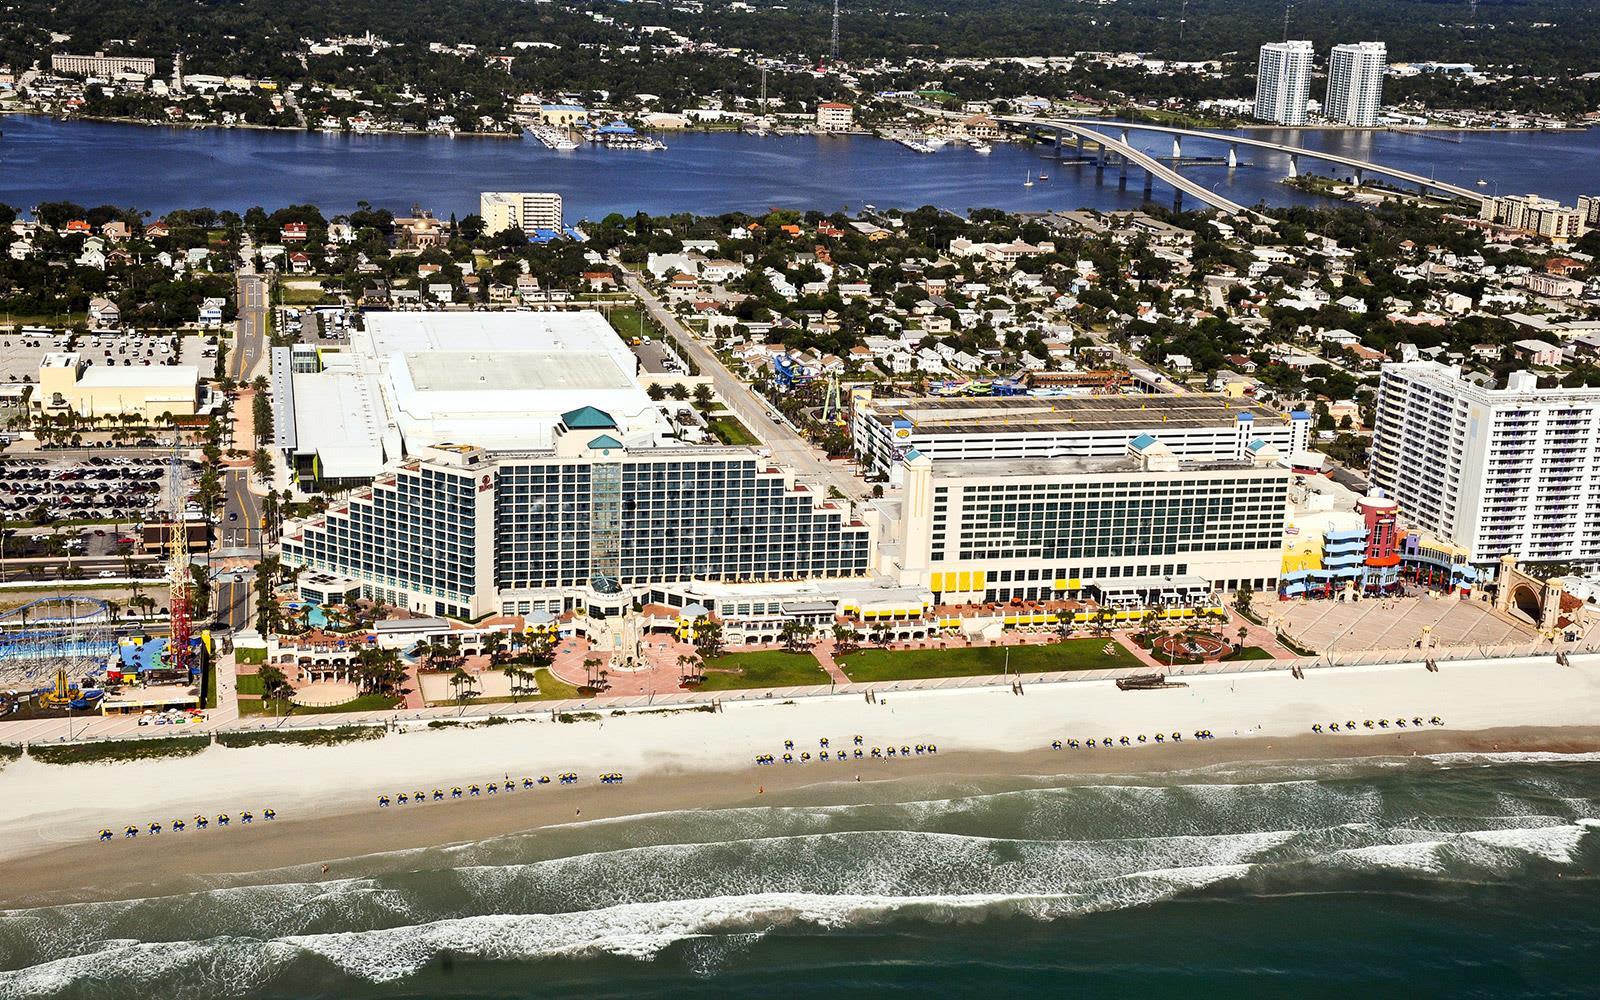 Hilton Daytona Beach Resort/Ocean Walk Village Thanks